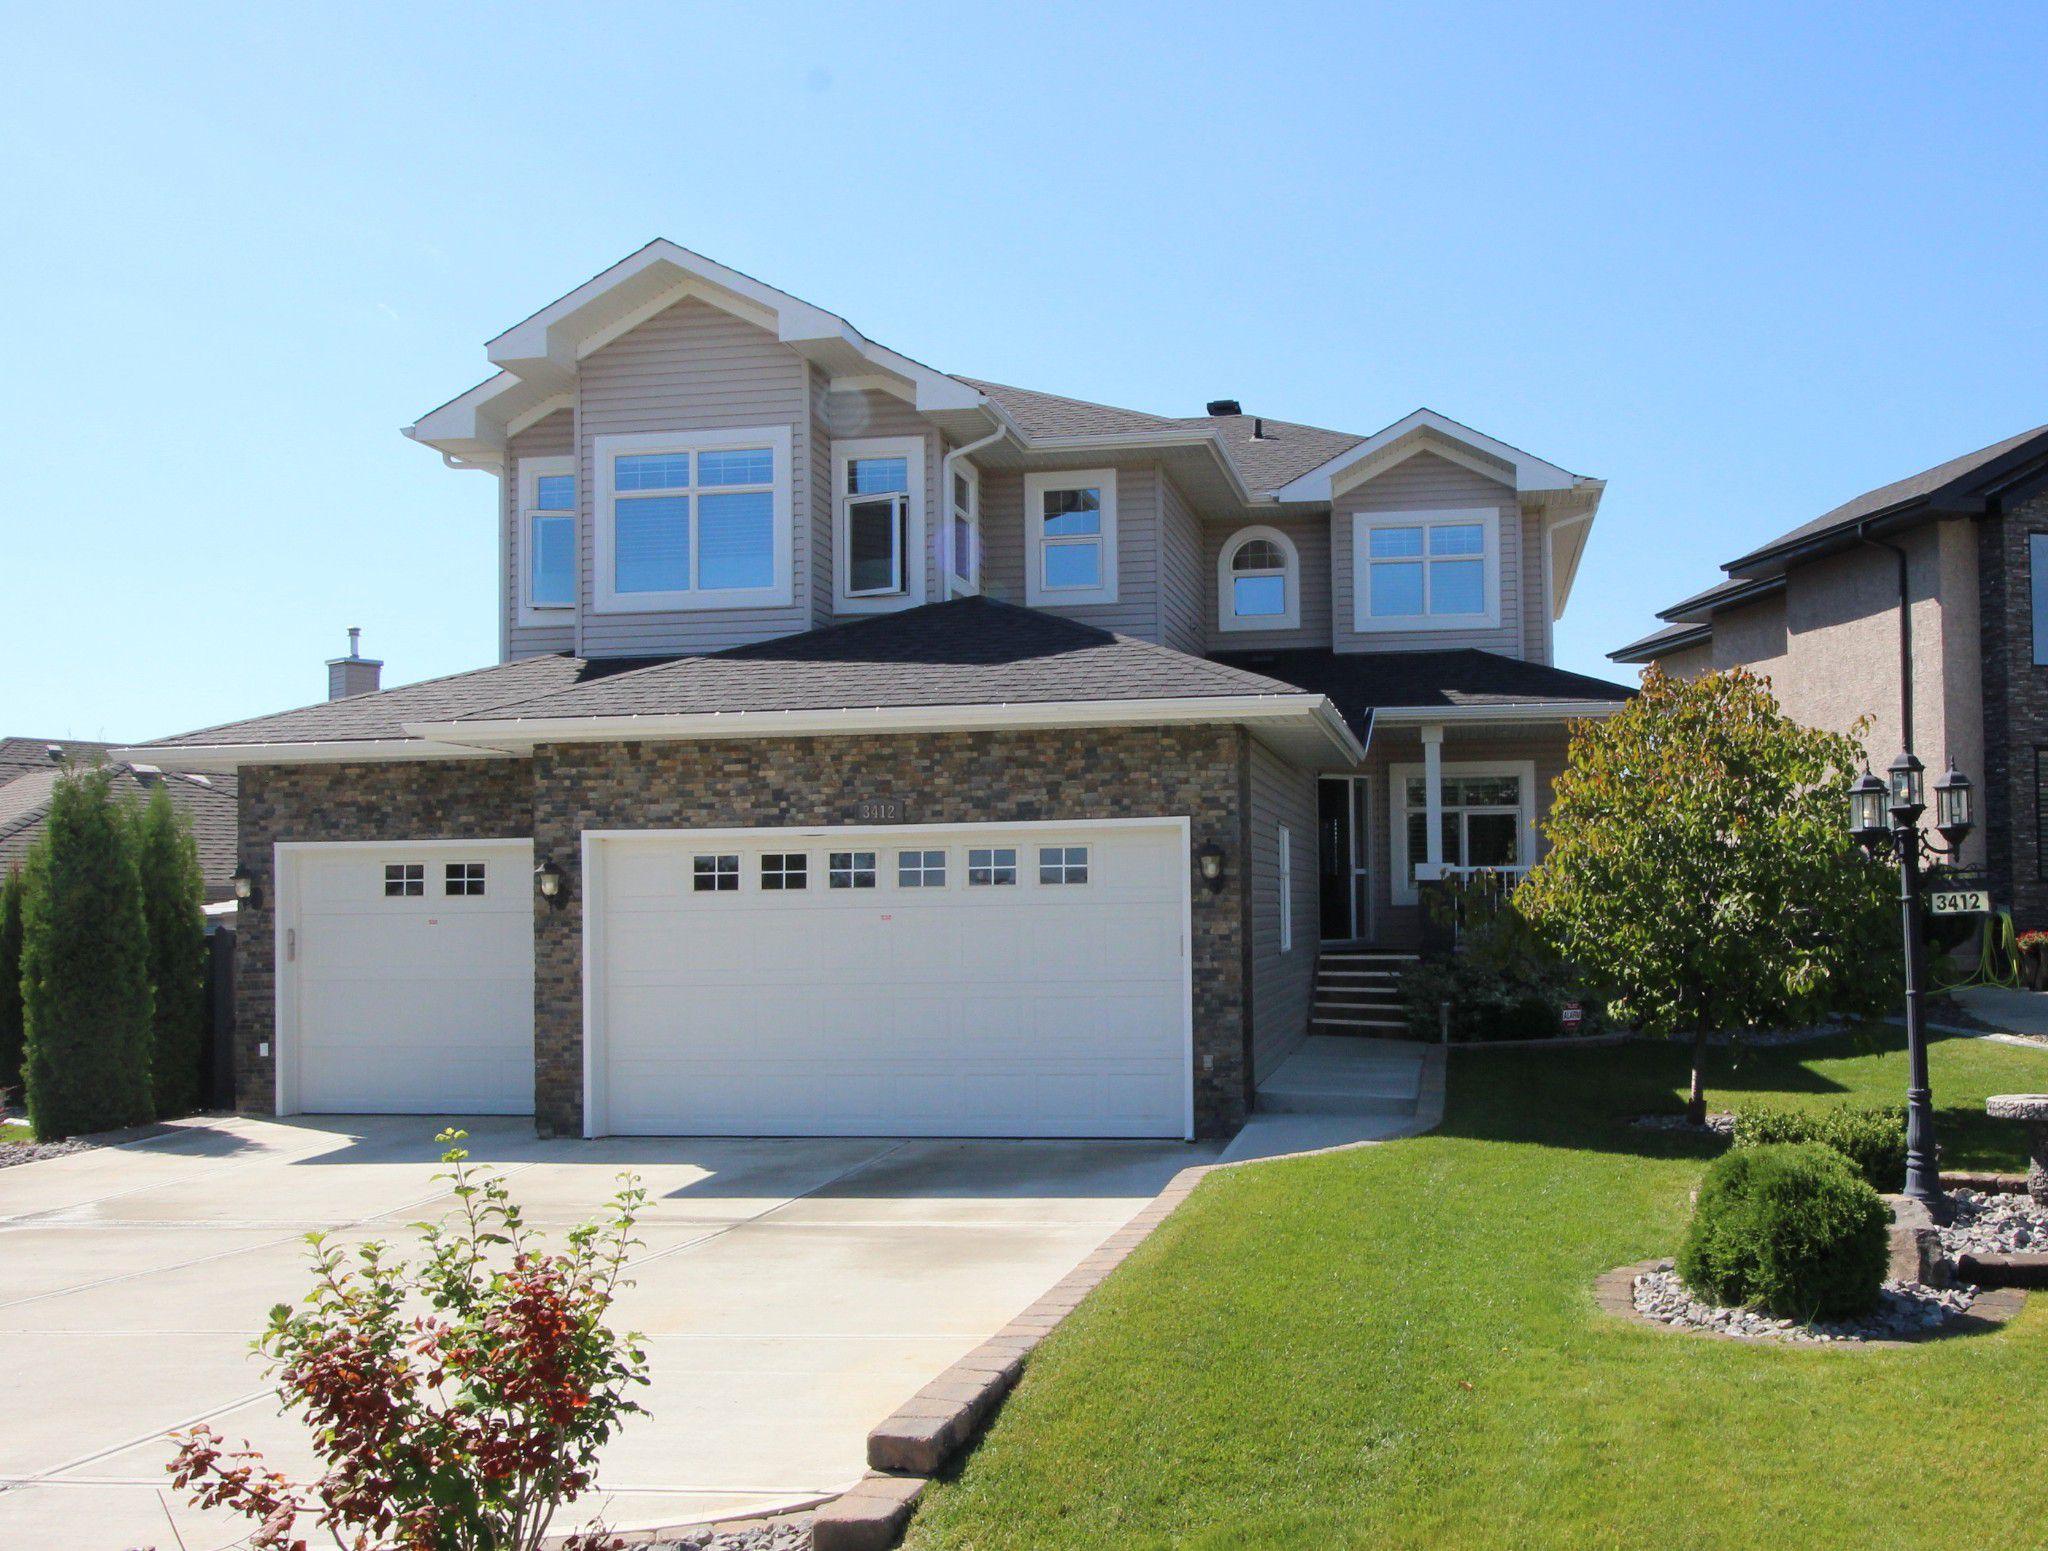 Main Photo: 3412 macNeil Link in Edmonton: House for sale : MLS®# E4103257